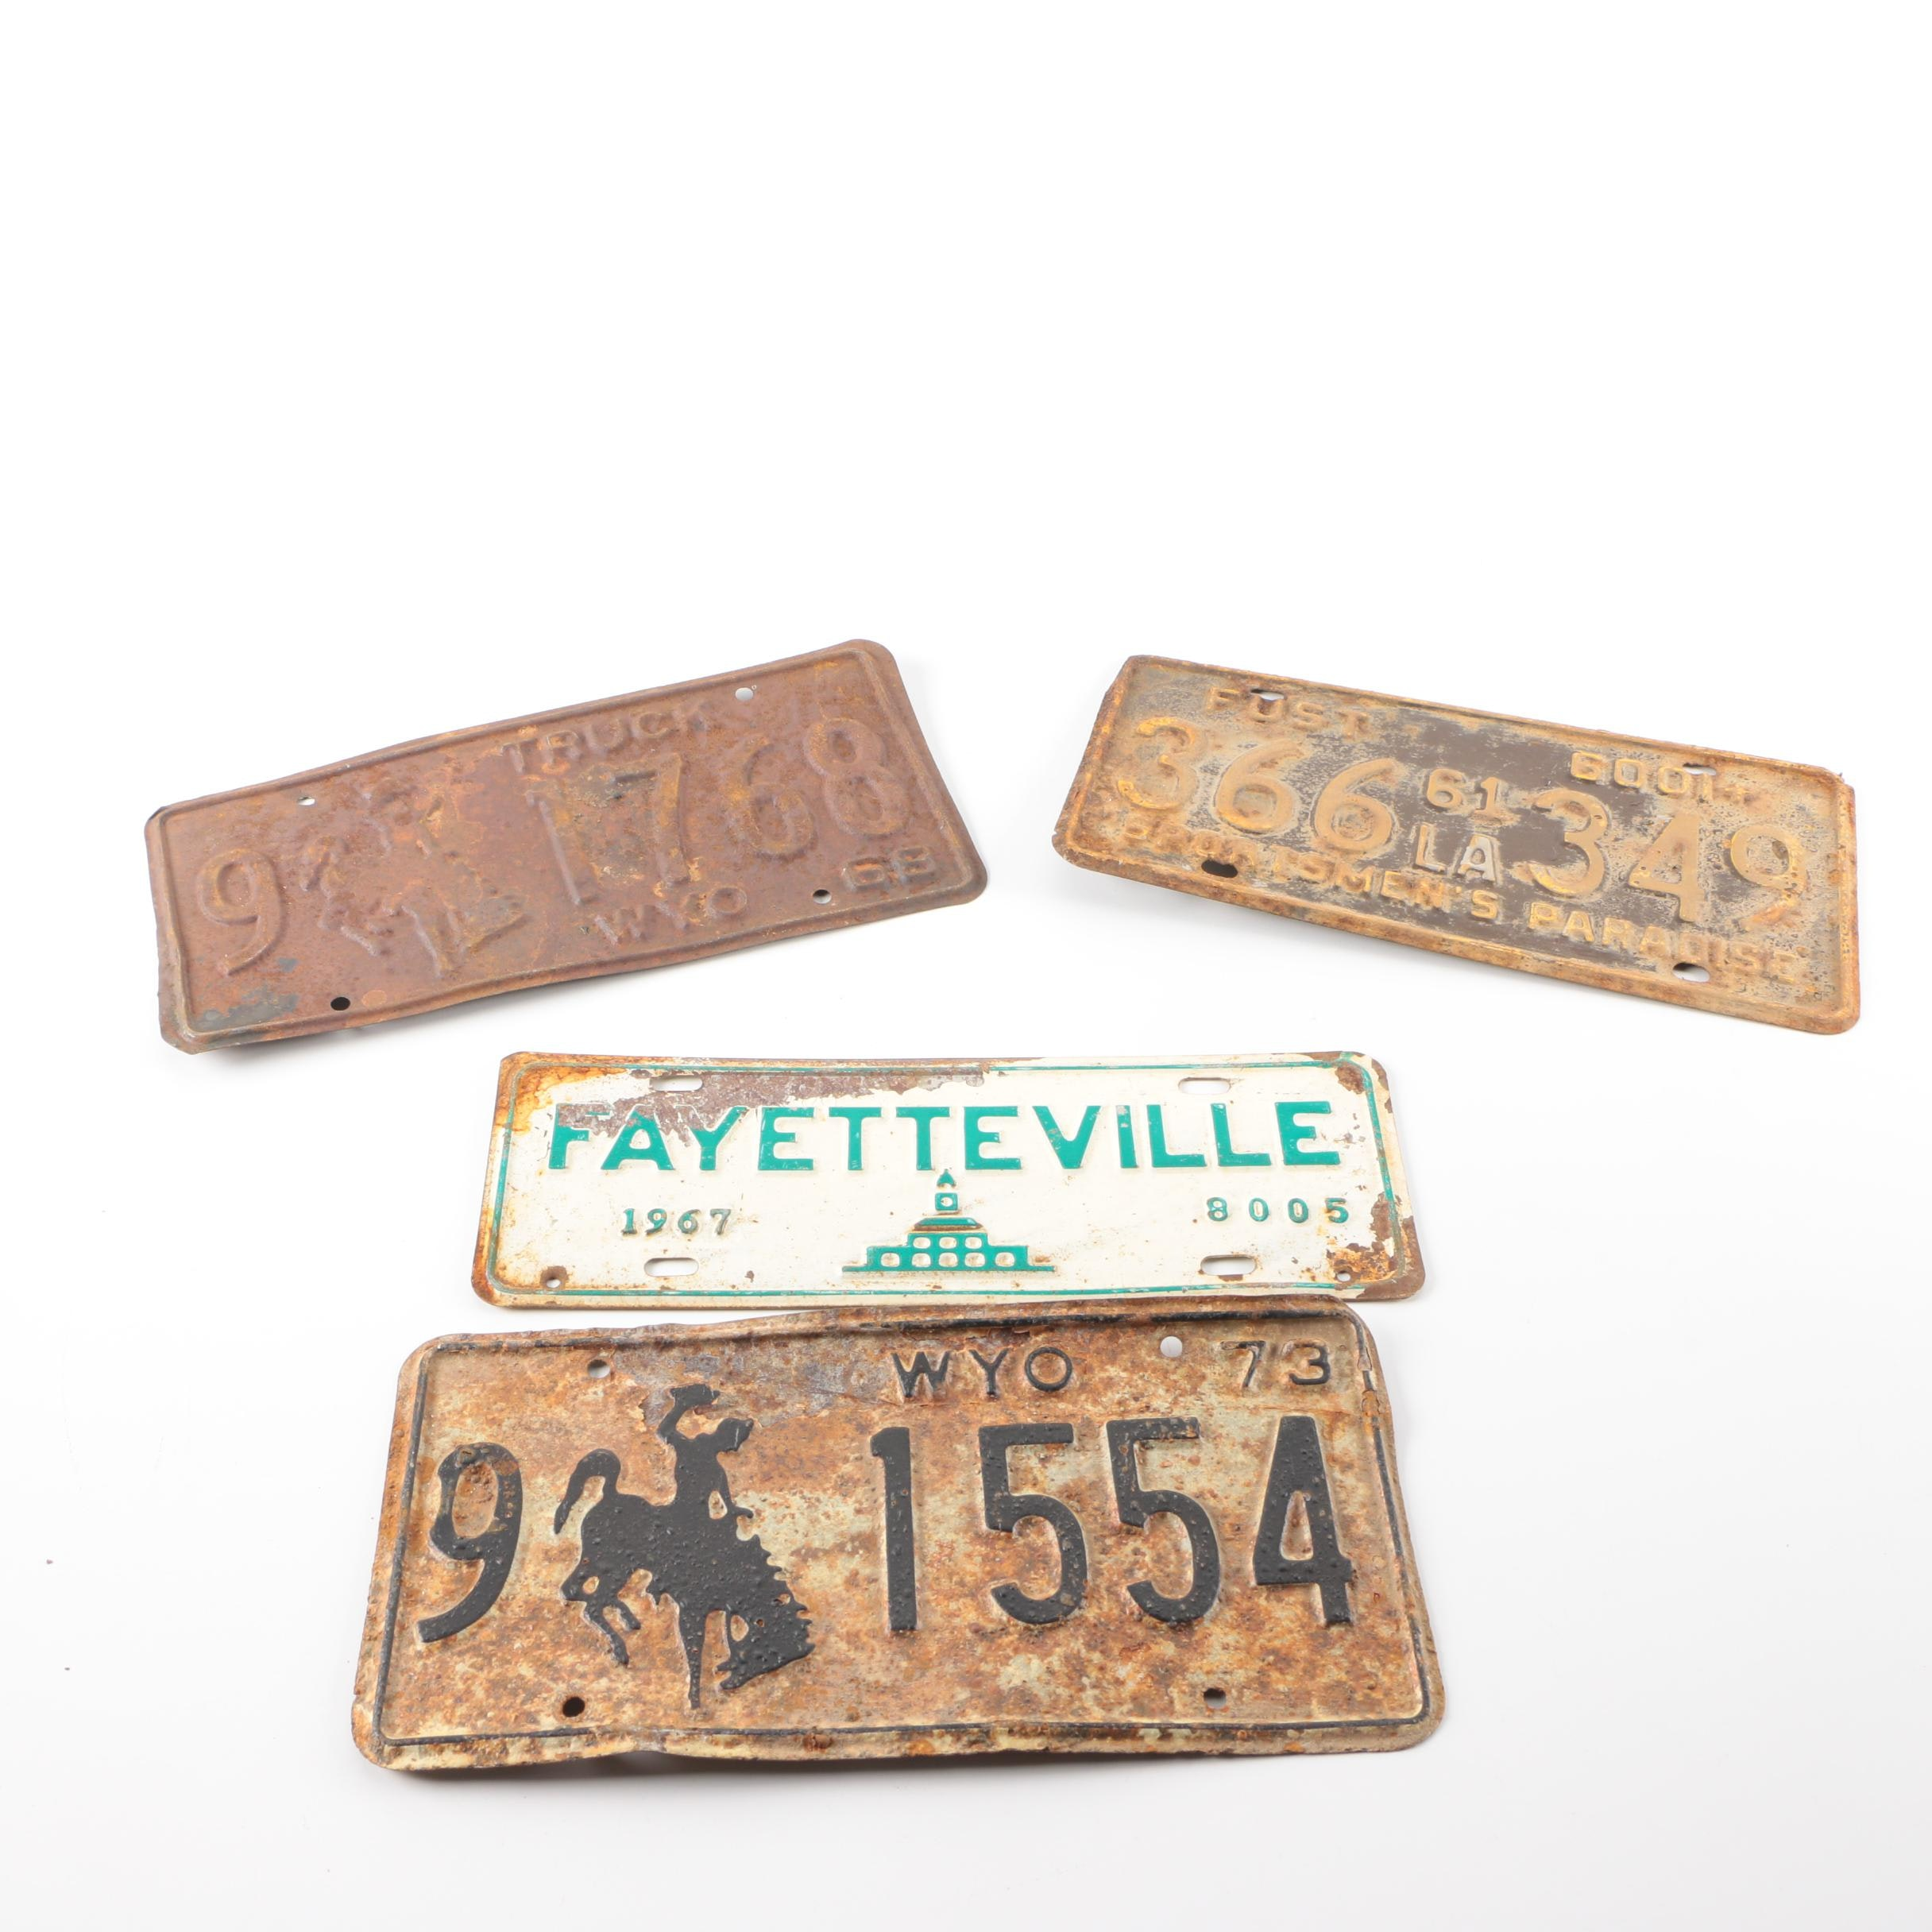 Vintage License Plates from Wyoming, Louisiana, and North Carolina